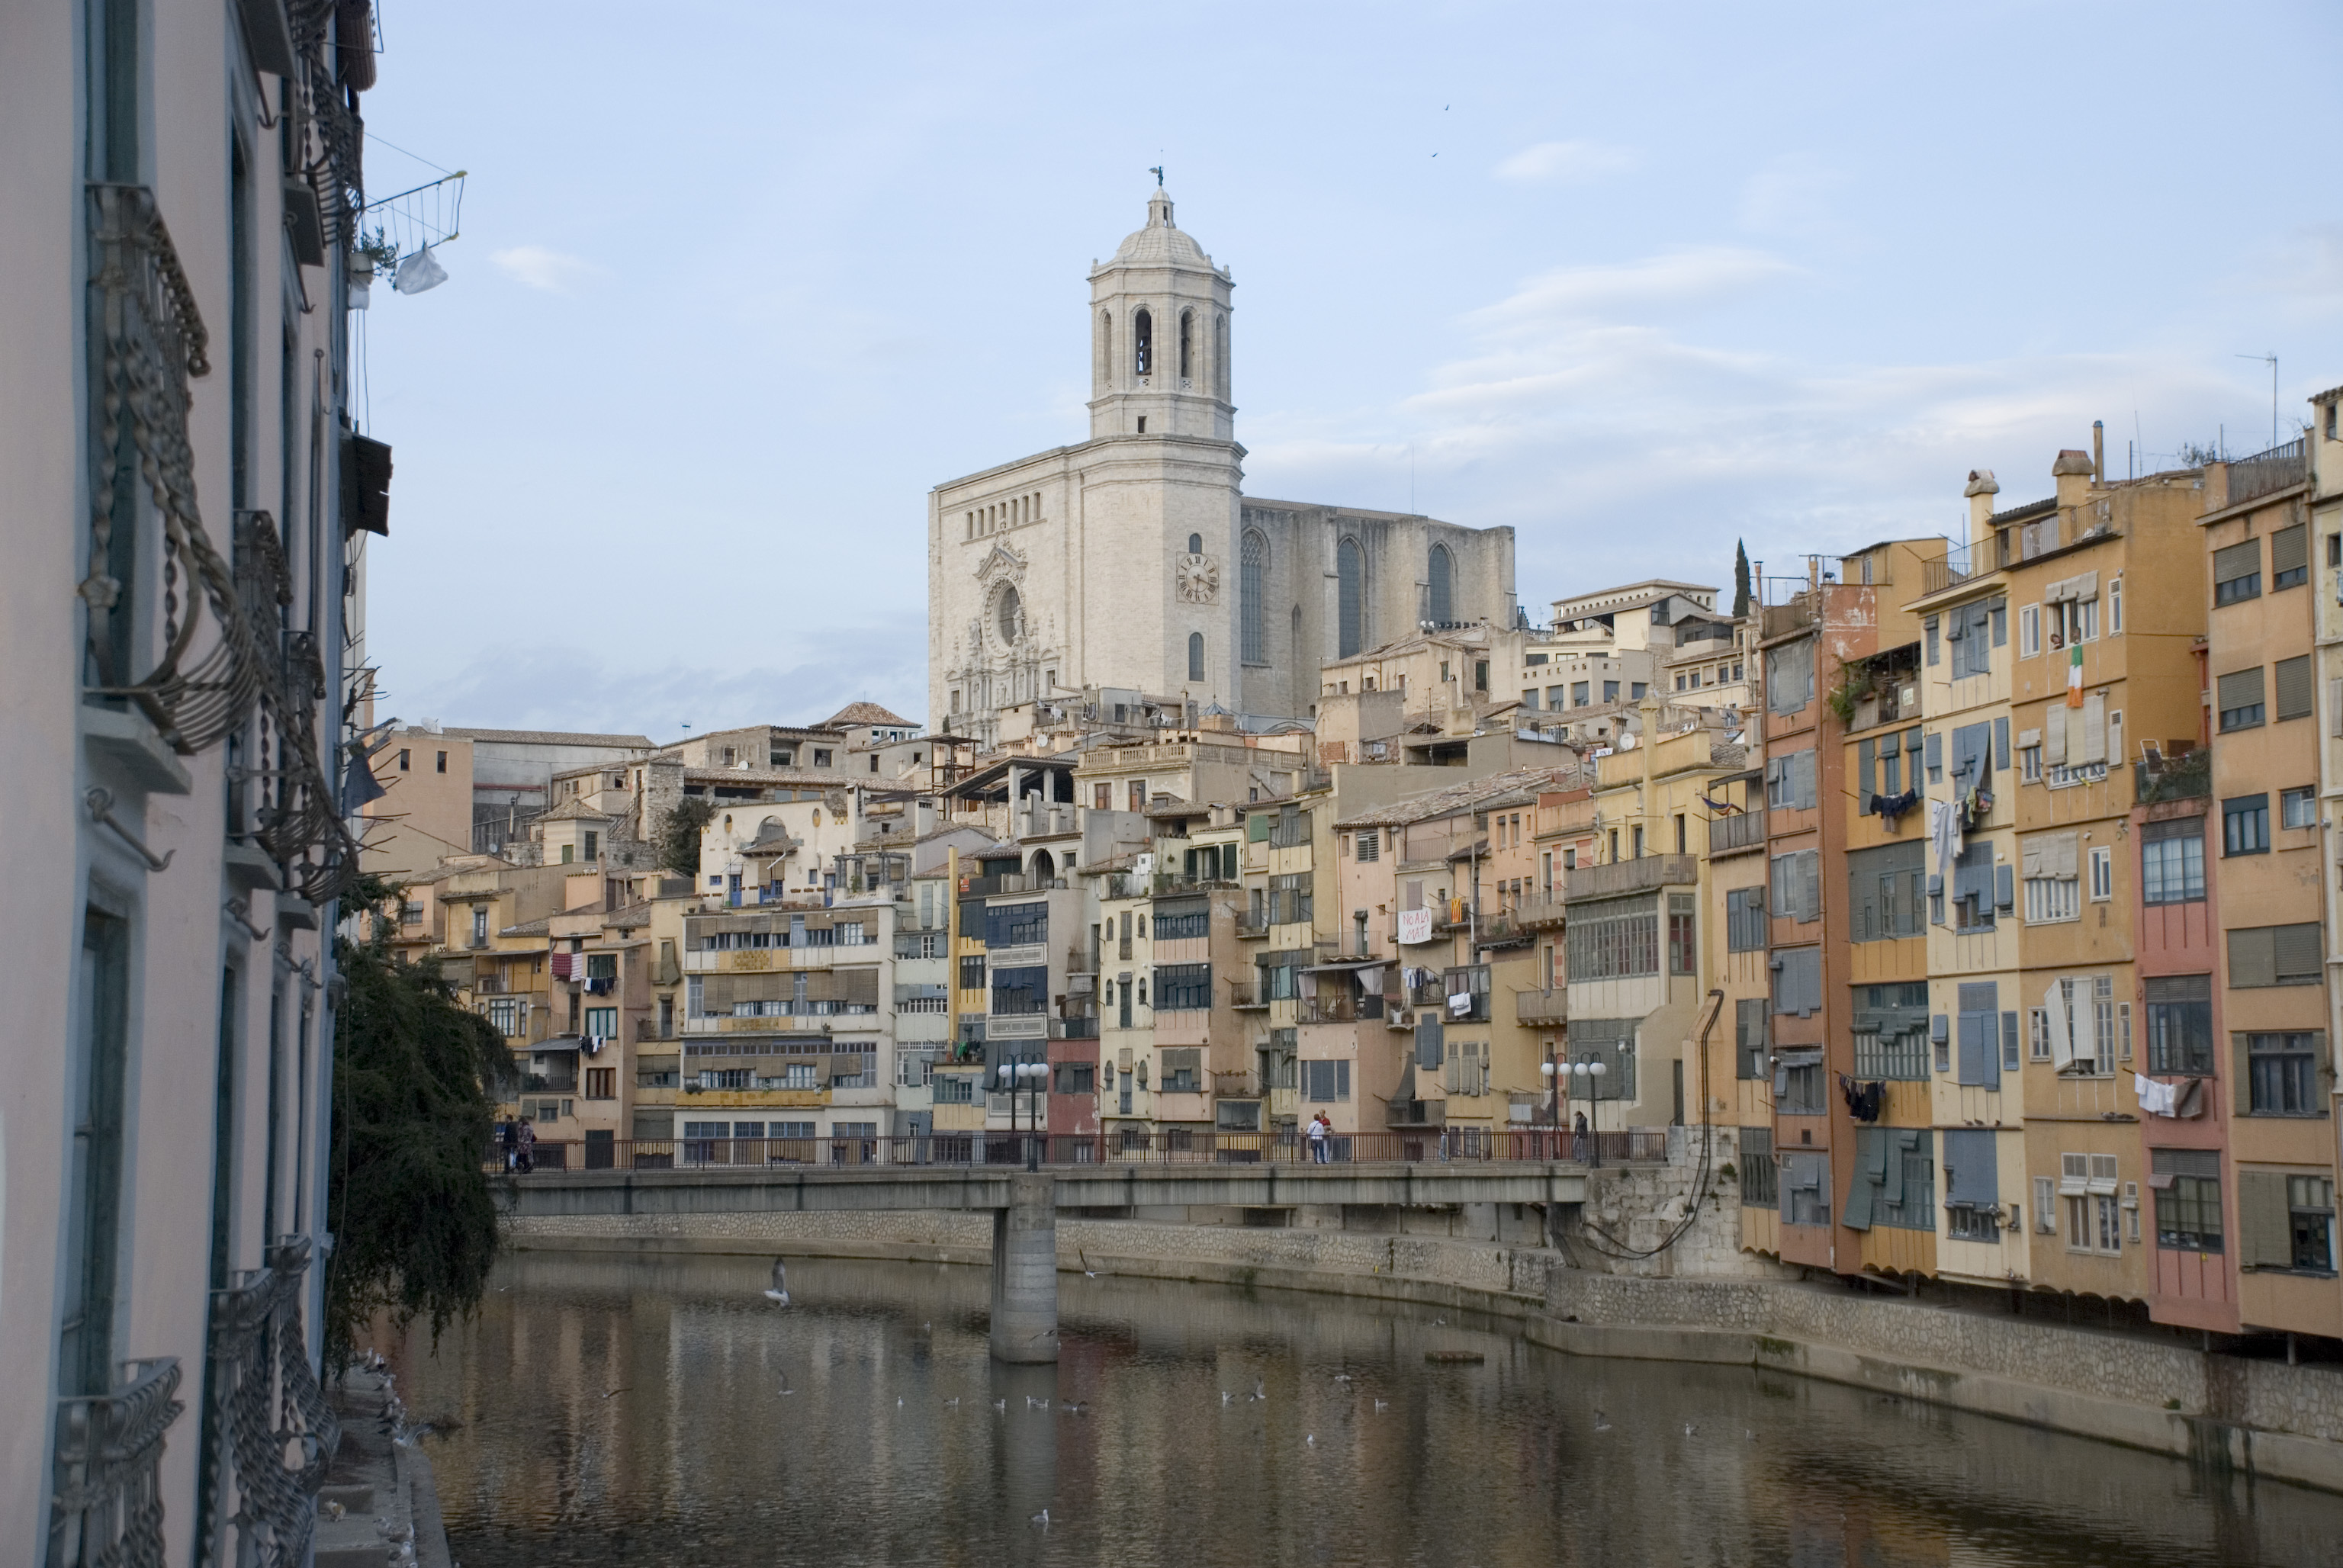 Ficheru:Girona.onyar.catedral2.jpg - Wikipedia